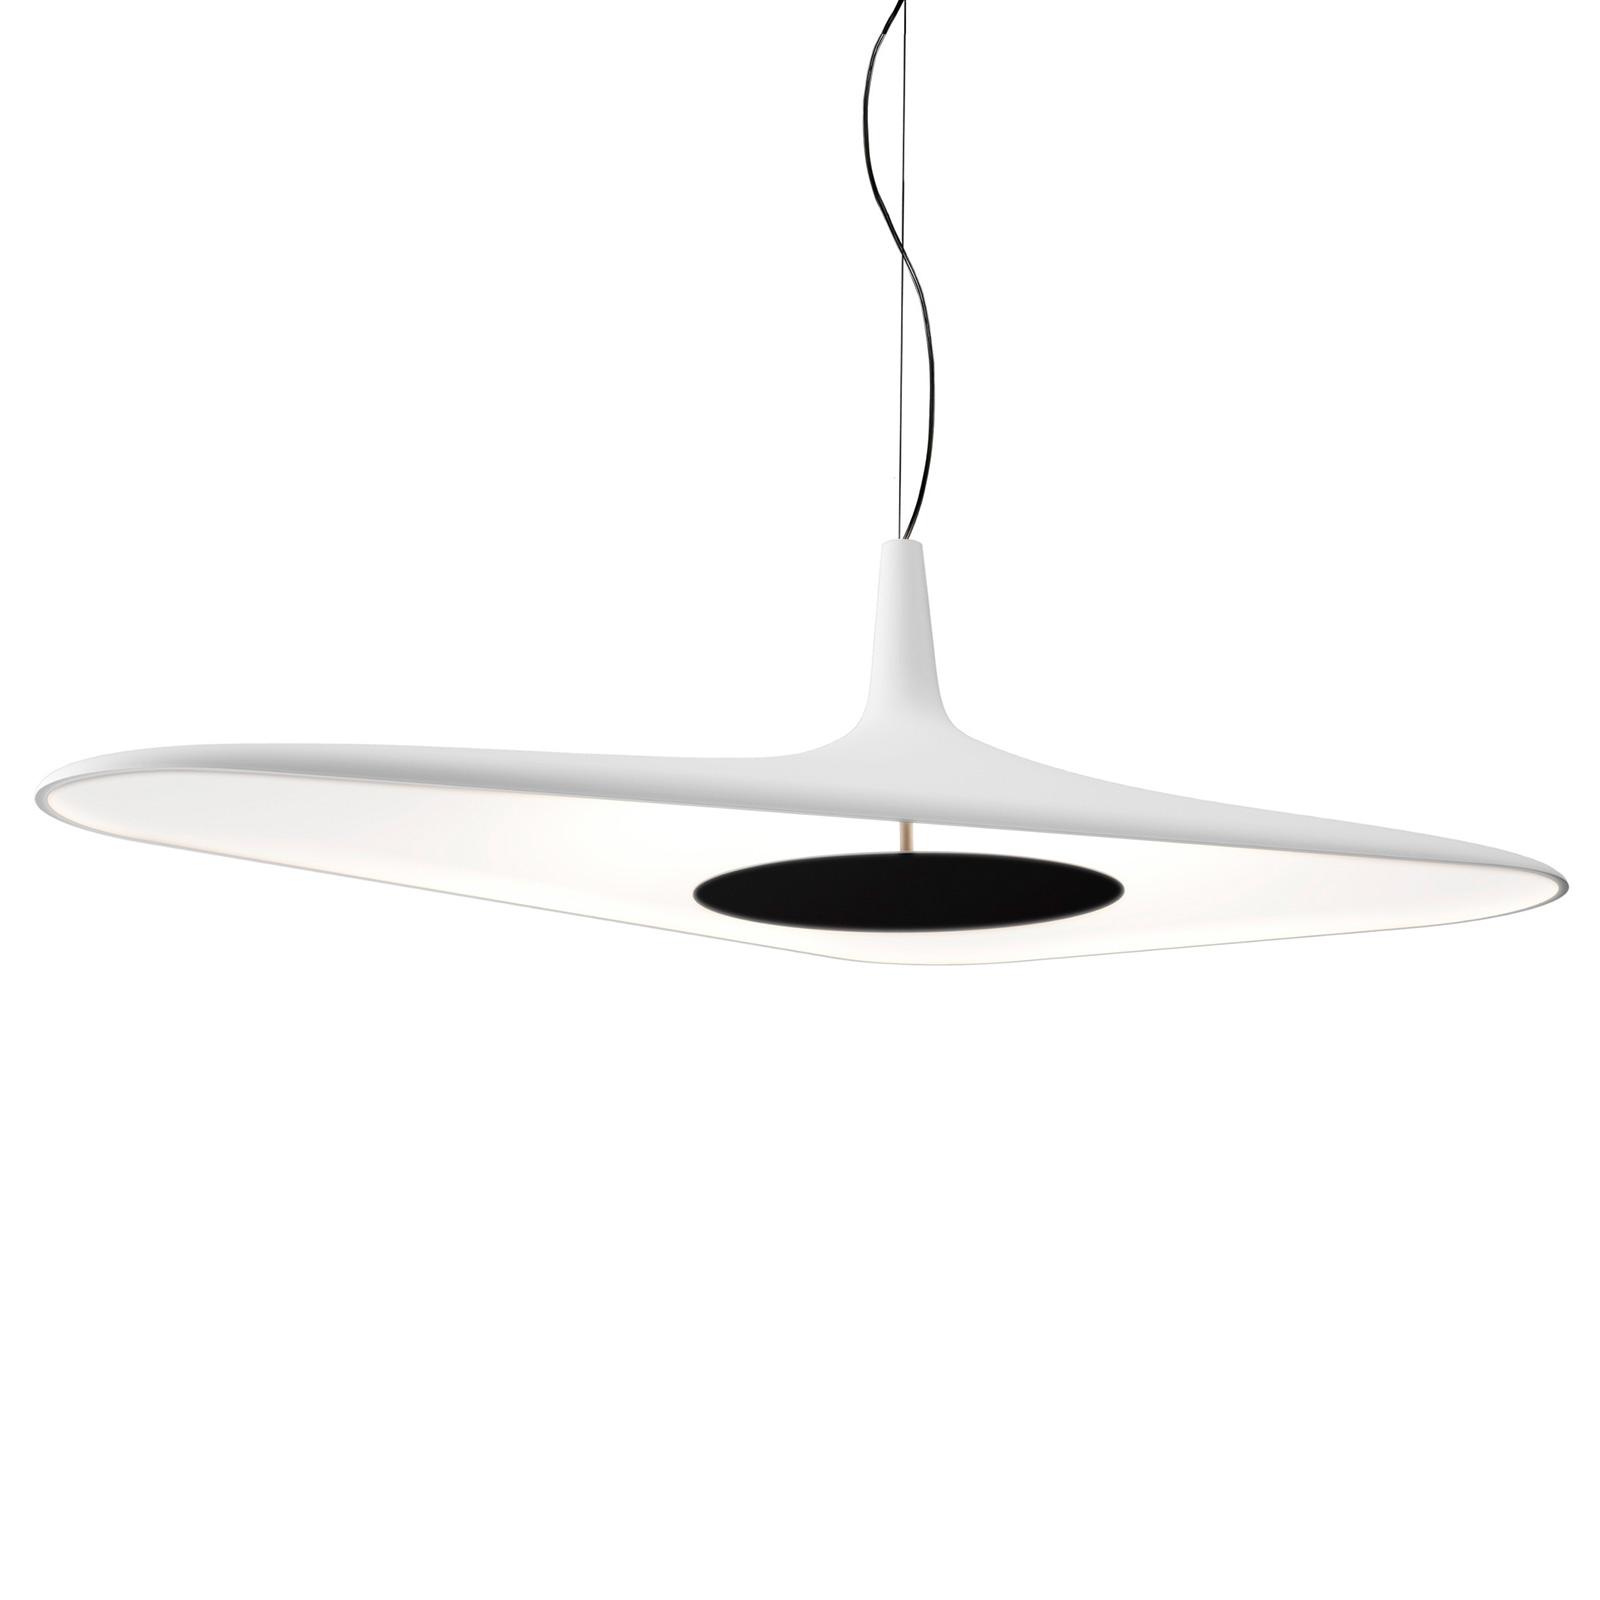 Luceplan Soleil Noir - lampa wisząca LED, biała